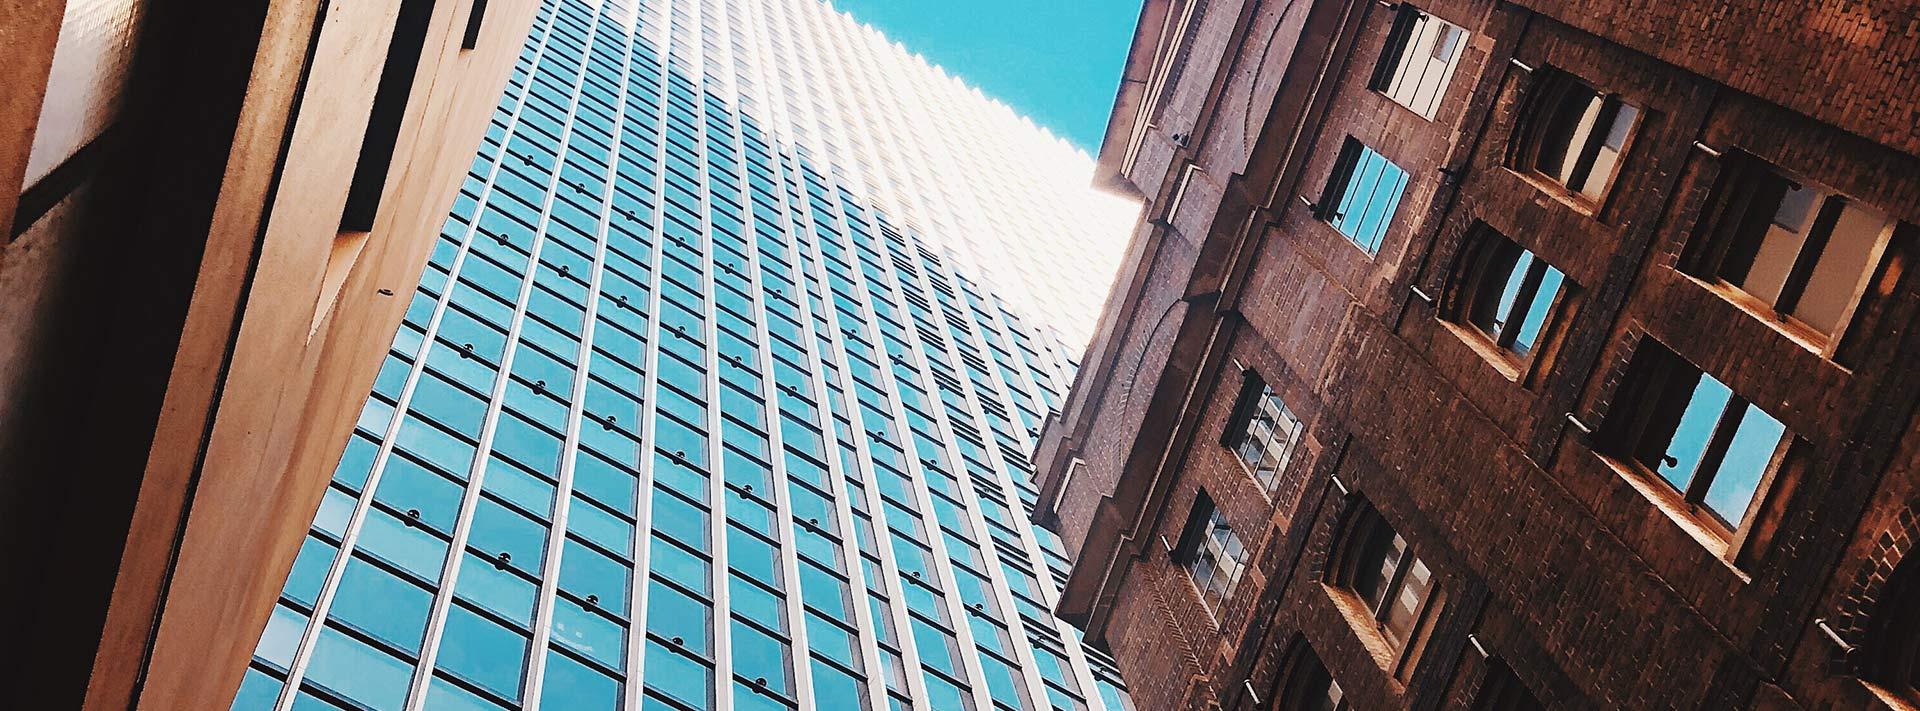 Australian building construction continues momentous climb